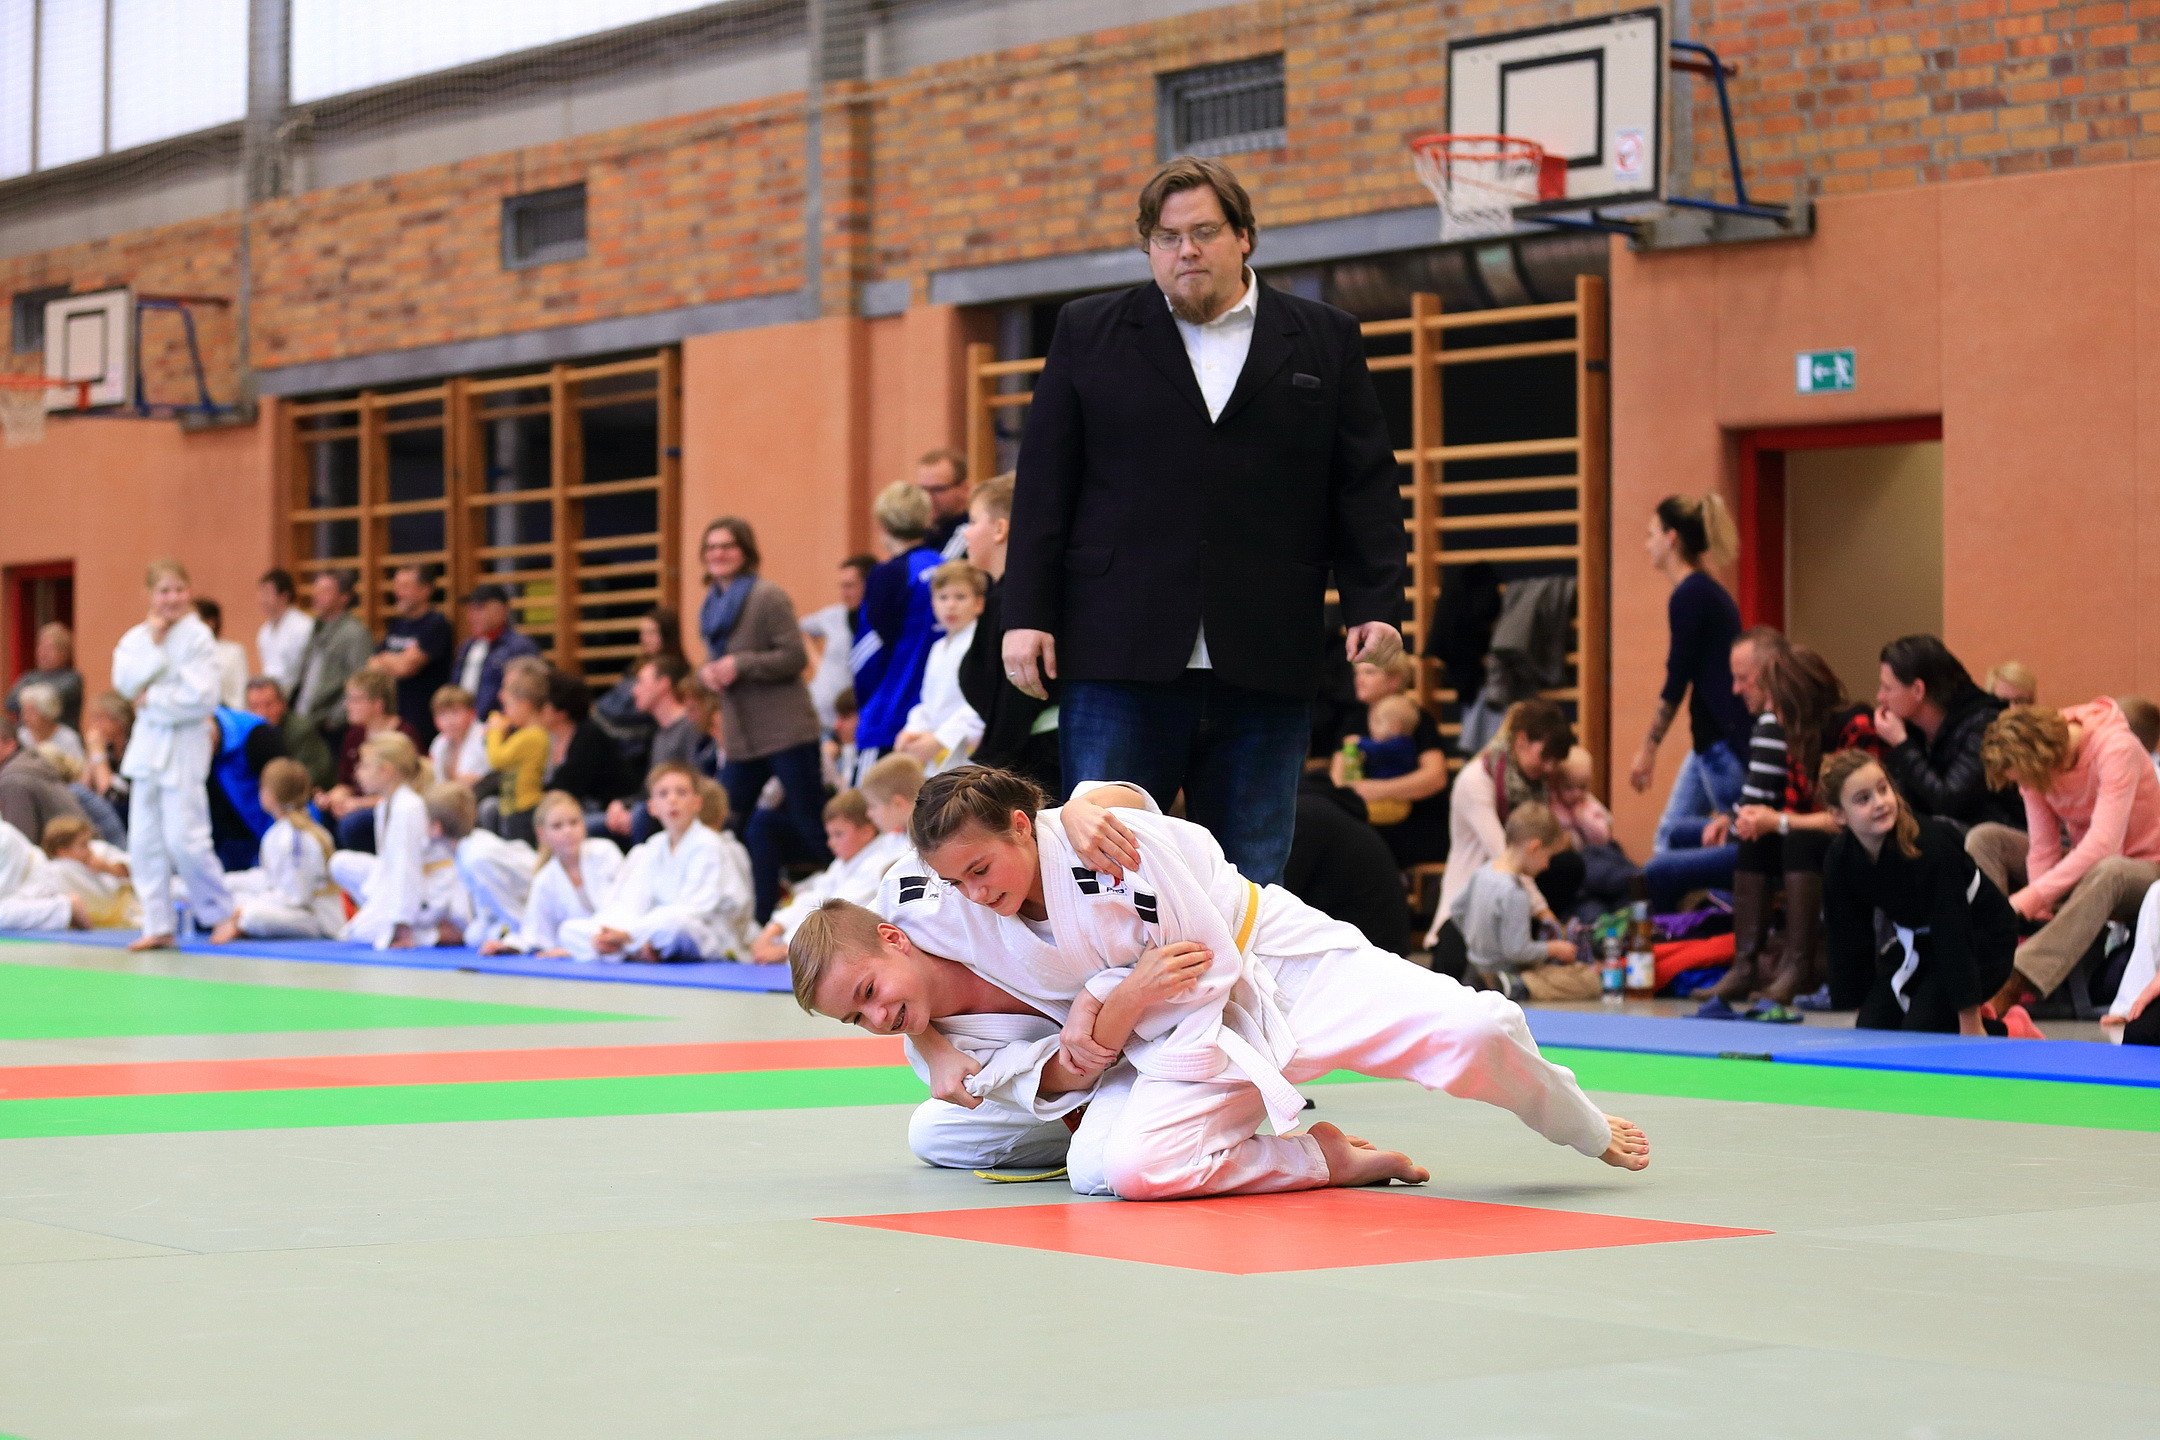 2016-Nikolausturnier Judokas Schwedt (49)